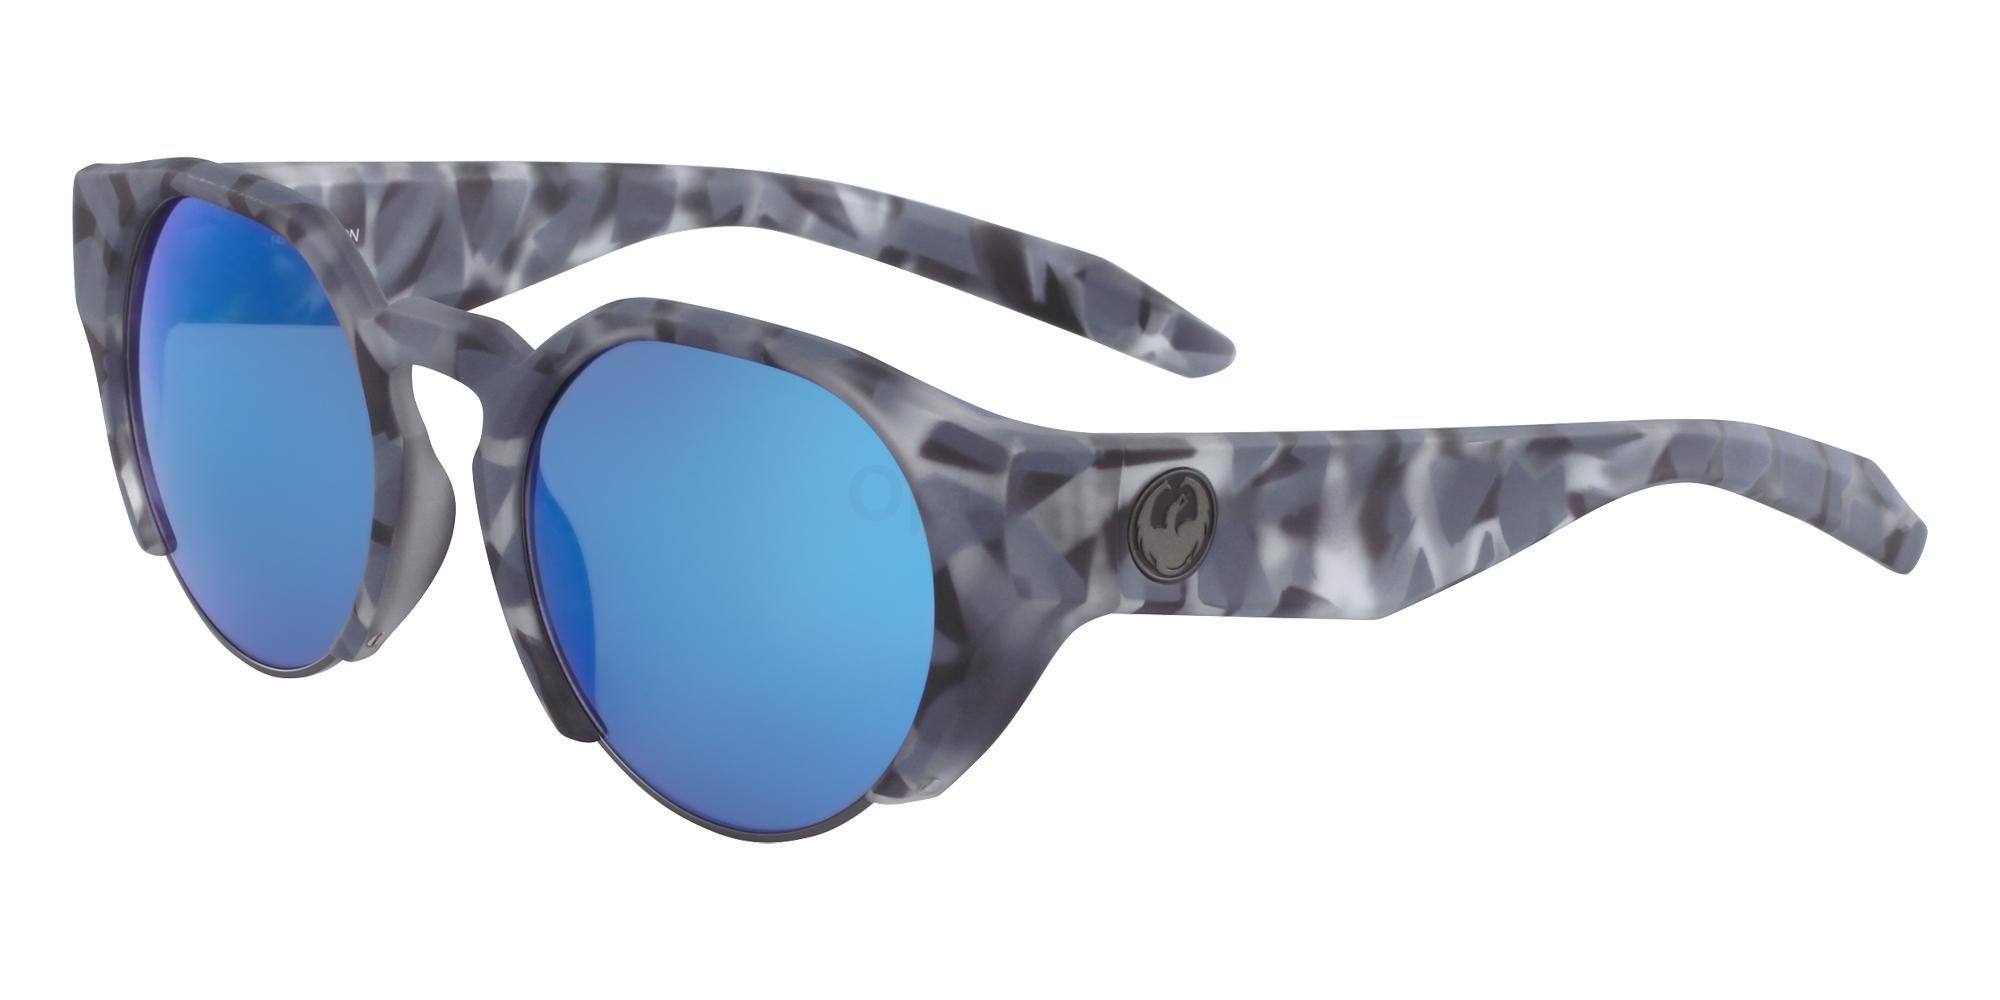 462 DR COMPASS ION Sunglasses, Dragon